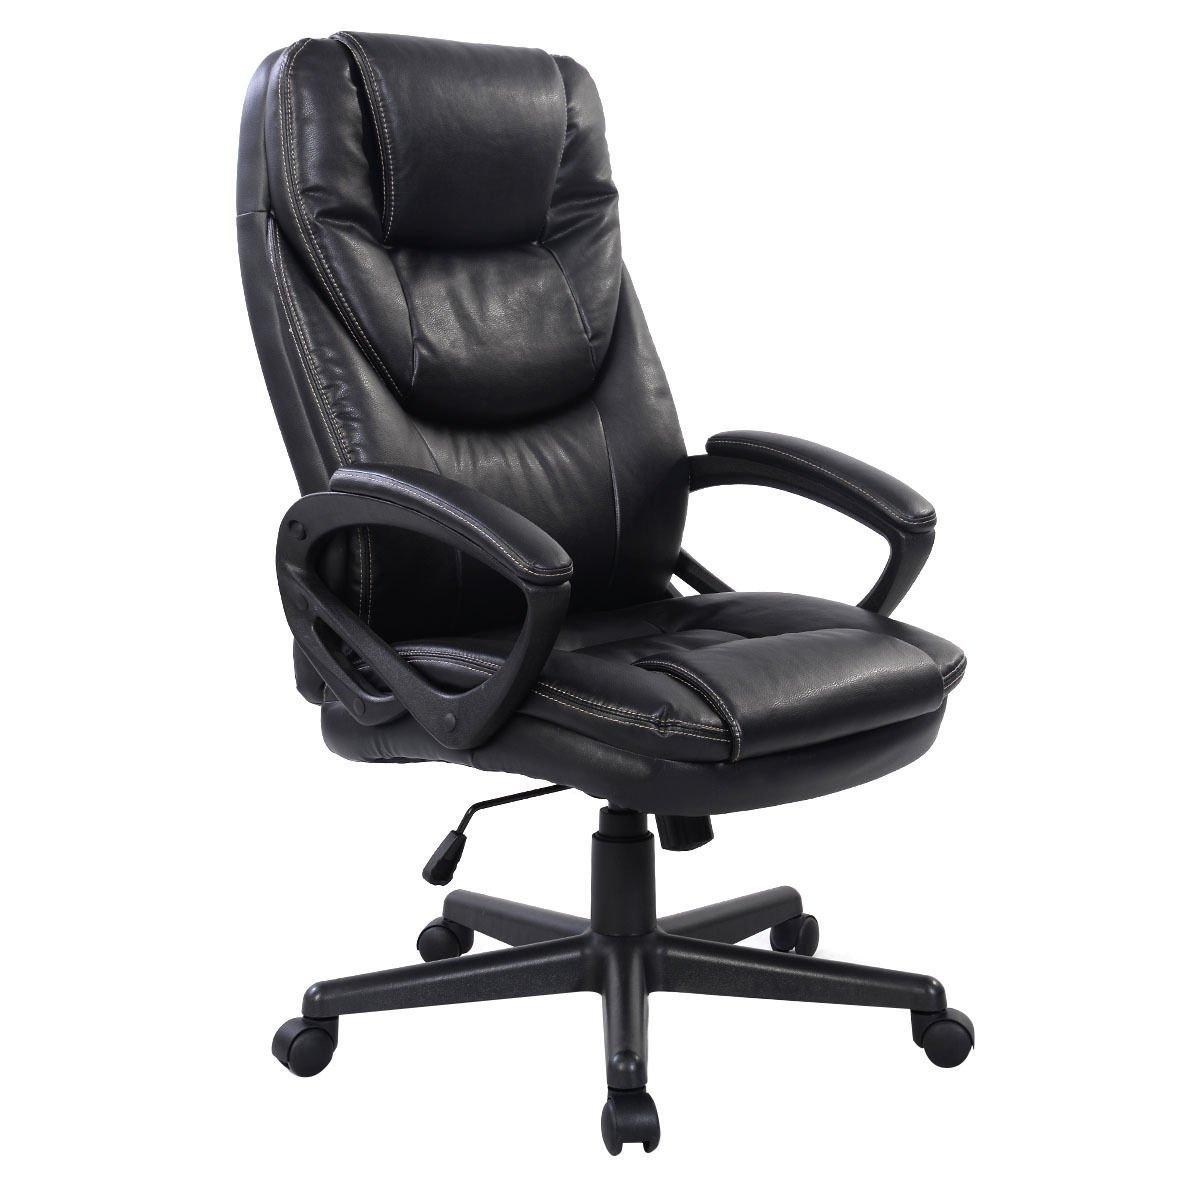 Giantex Ergonomic Office Chair High Back PU Leather Home Adjustable Swivel Executive Desk Chair Black